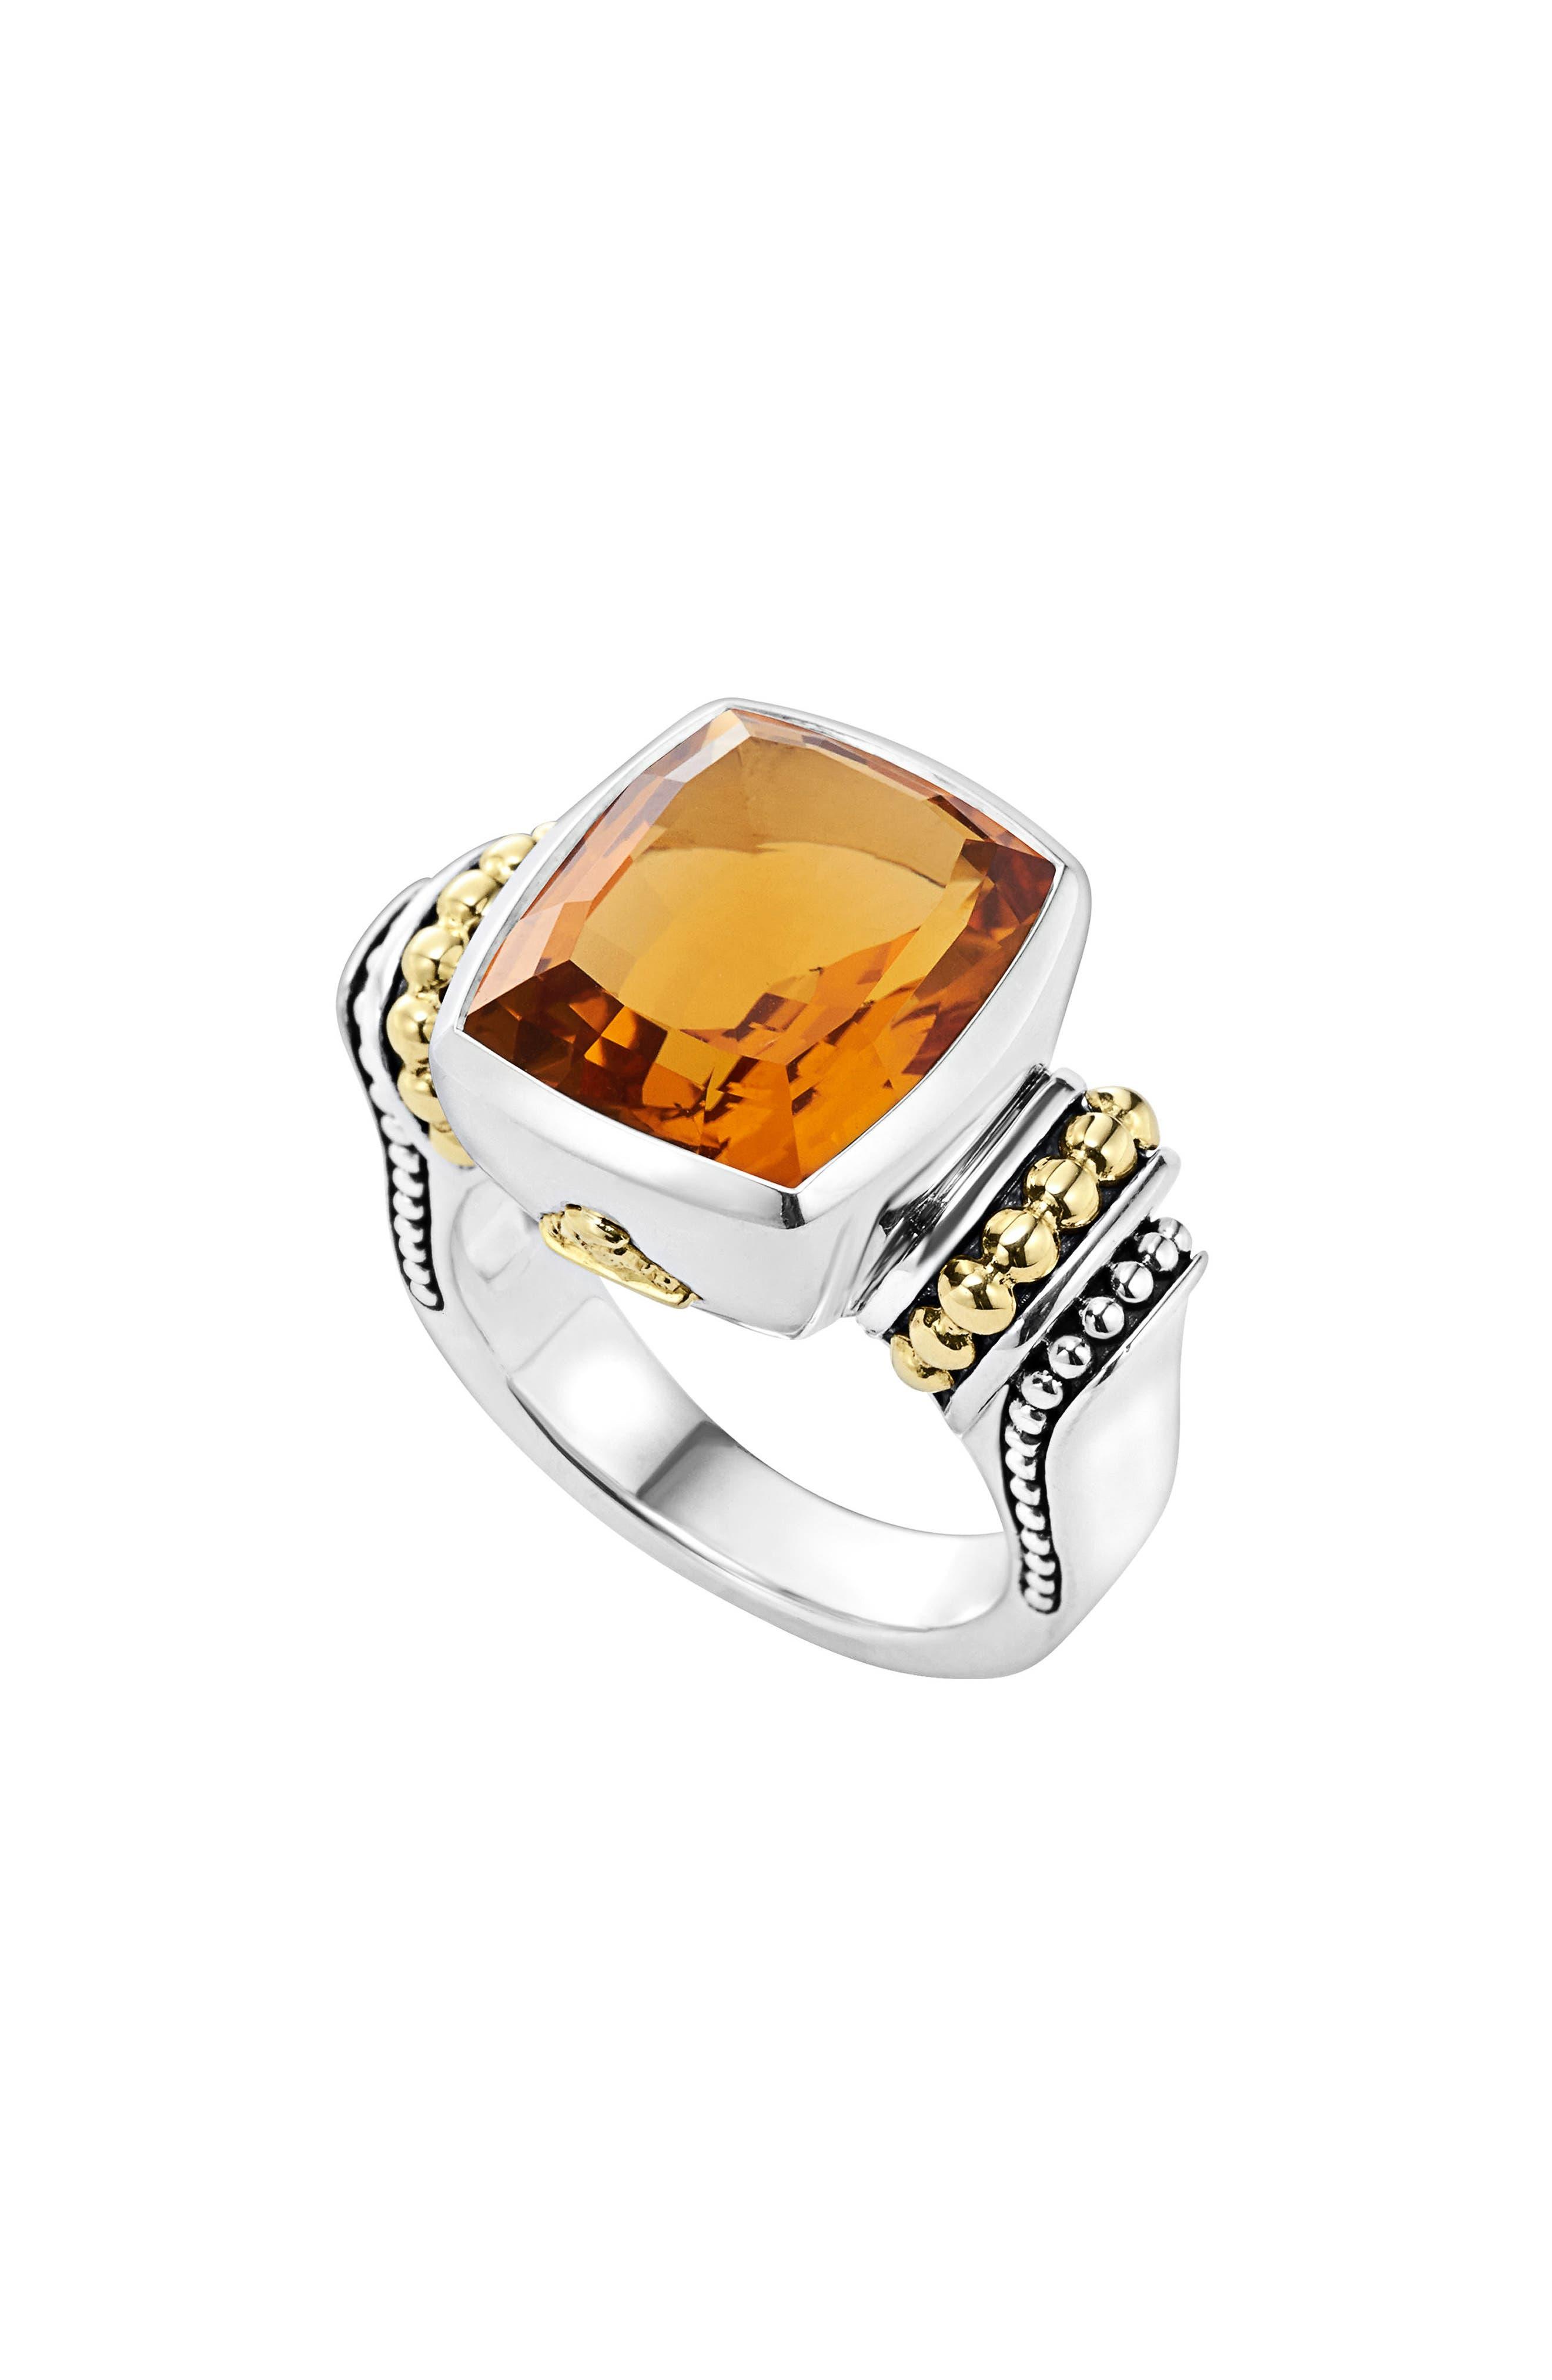 LAGOS 'Caviar Color' Medium Semiprecious Stone Ring